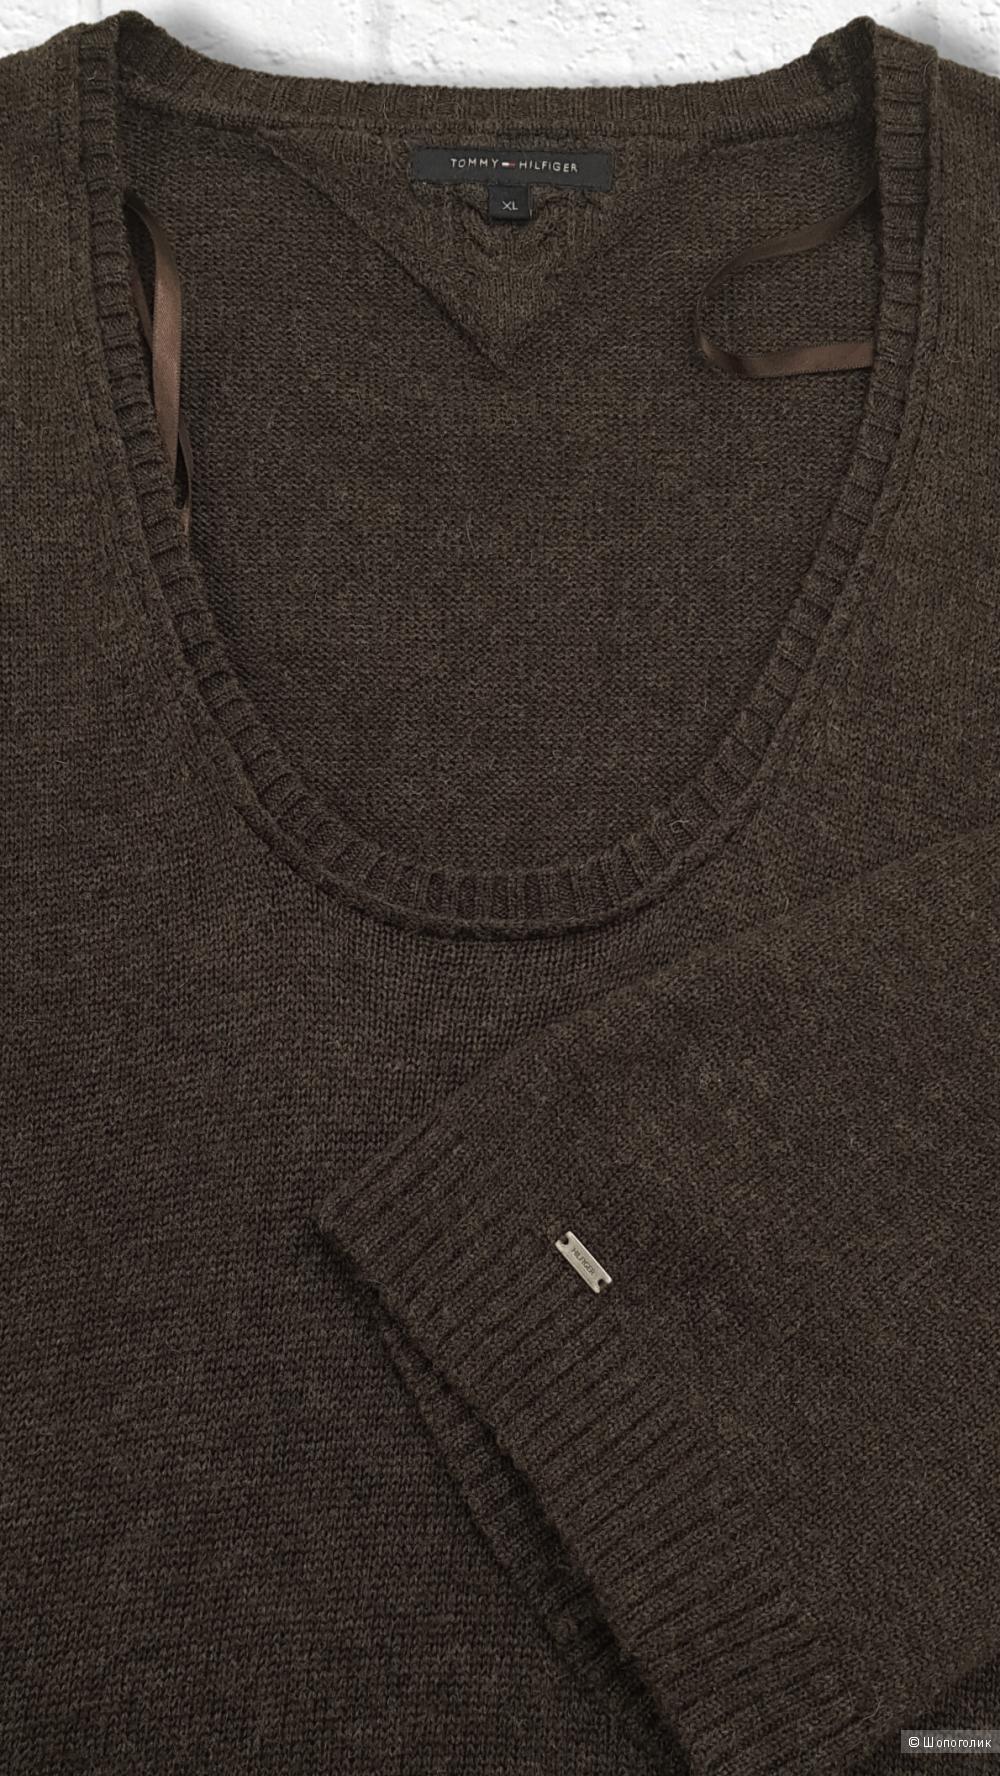 Платье-джемпер. Tommy Hilfiger. XL/48+/50/52